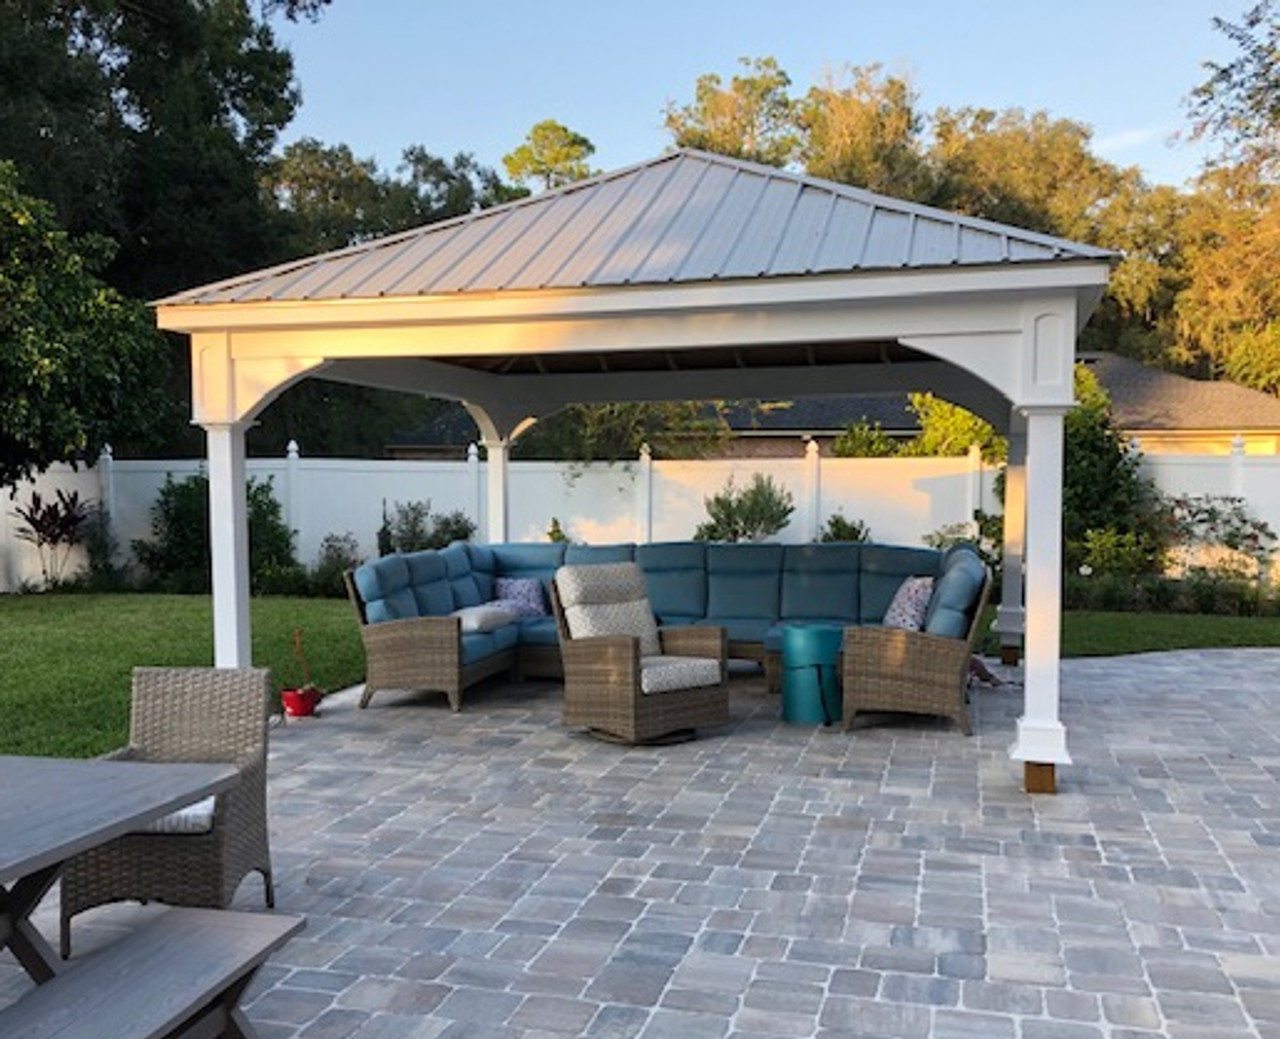 16x16 Pressure Treated Pine Traditional (Hip) Roof Pavilion Jacksonville FL